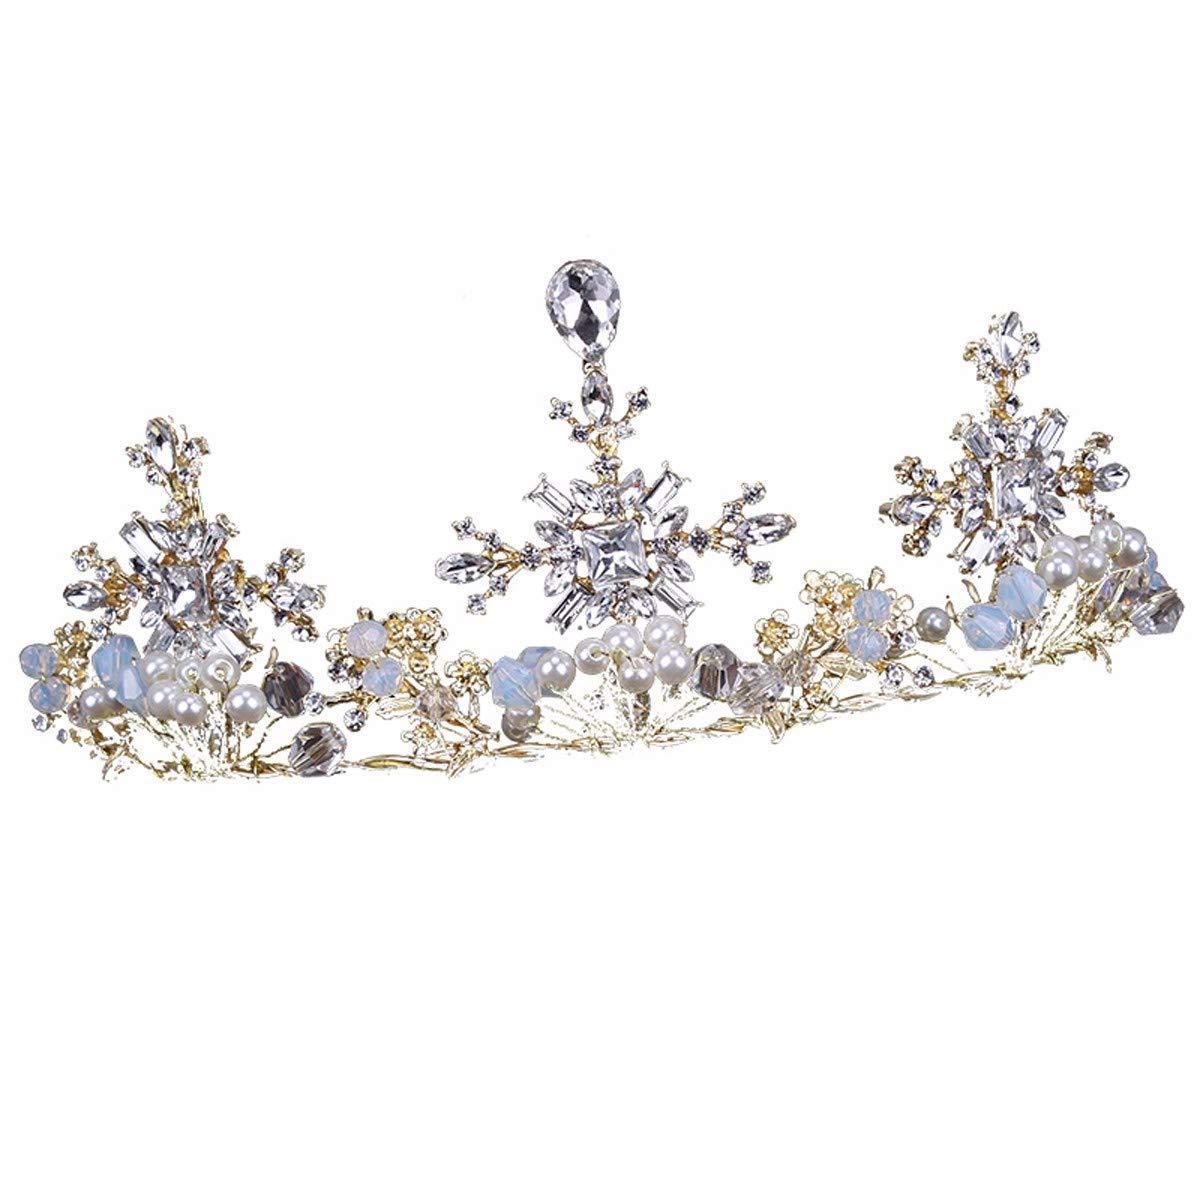 Wedding Crown, Beautiful headdress/Bridal Headwear Crown Suit Necklace Wedding Accessories Crown Wedding Accessories